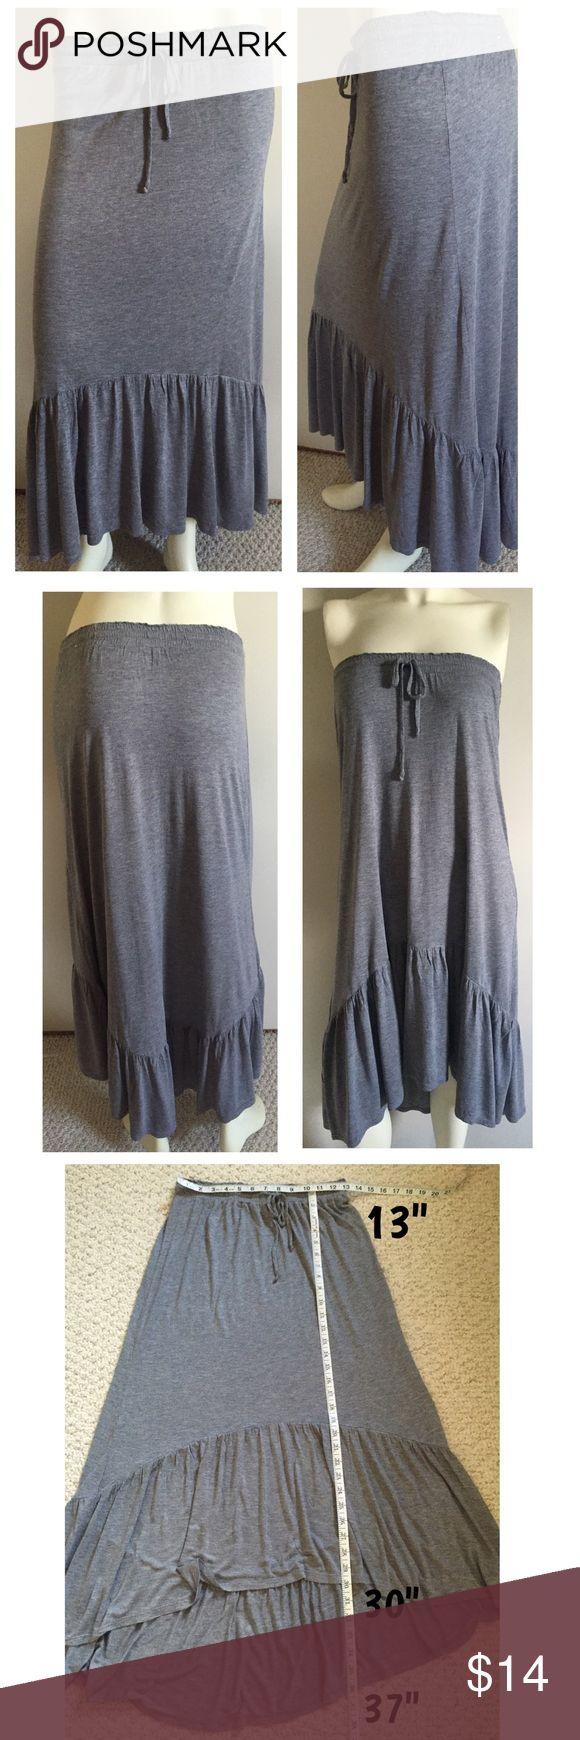 Spotted while shopping on Poshmark: Soft hi low fishtail gray jersey knit skirt JR M! #poshmark #fashion #shopping #style #Aeropostale #Dresses & Skirts